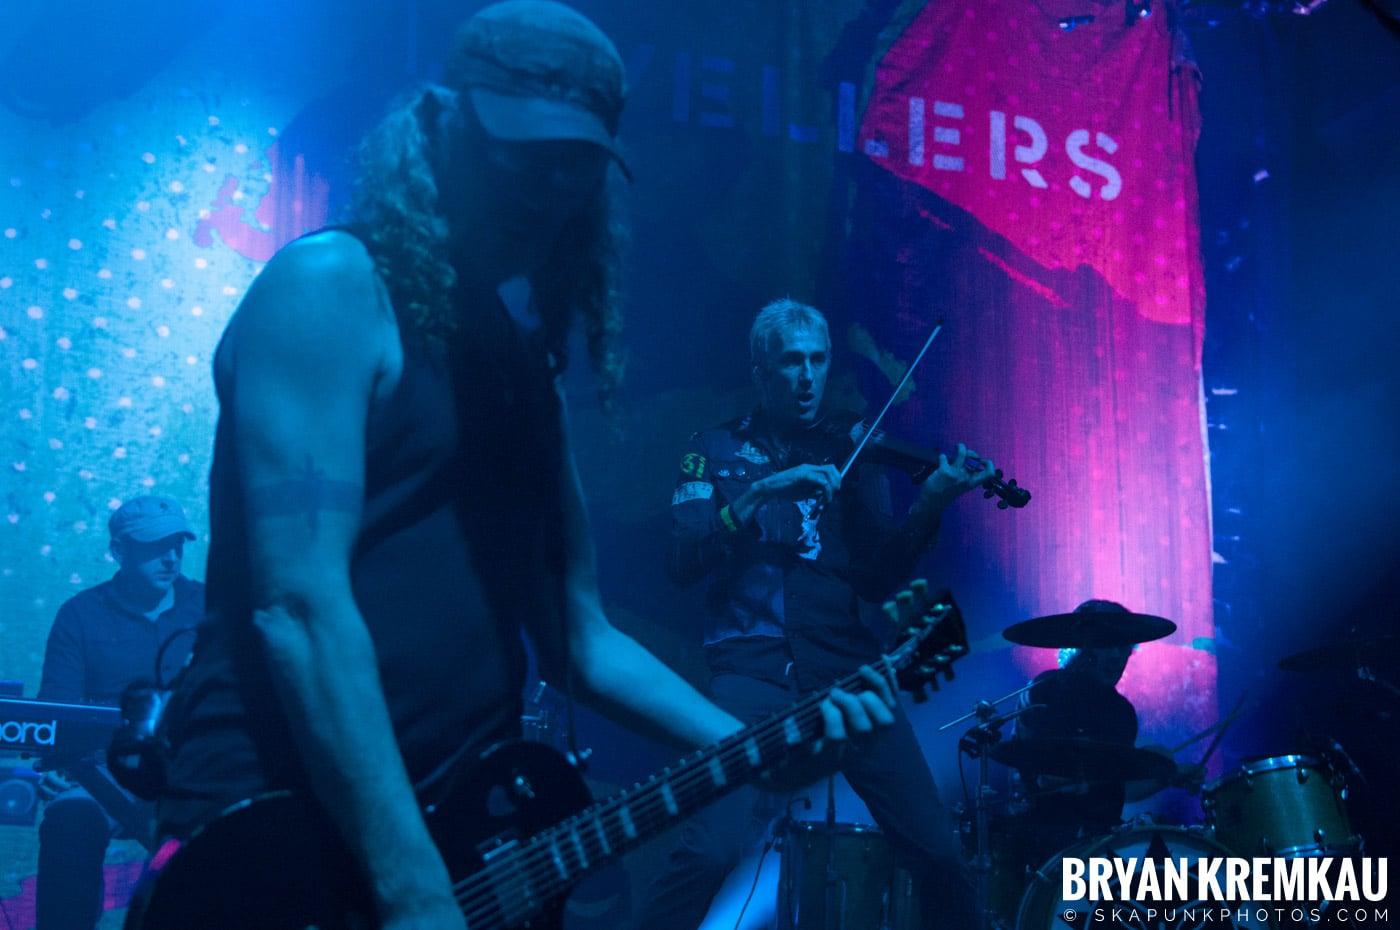 The Levellers @ Shepherds Bush Empire, London UK - 11.24.12 (4)